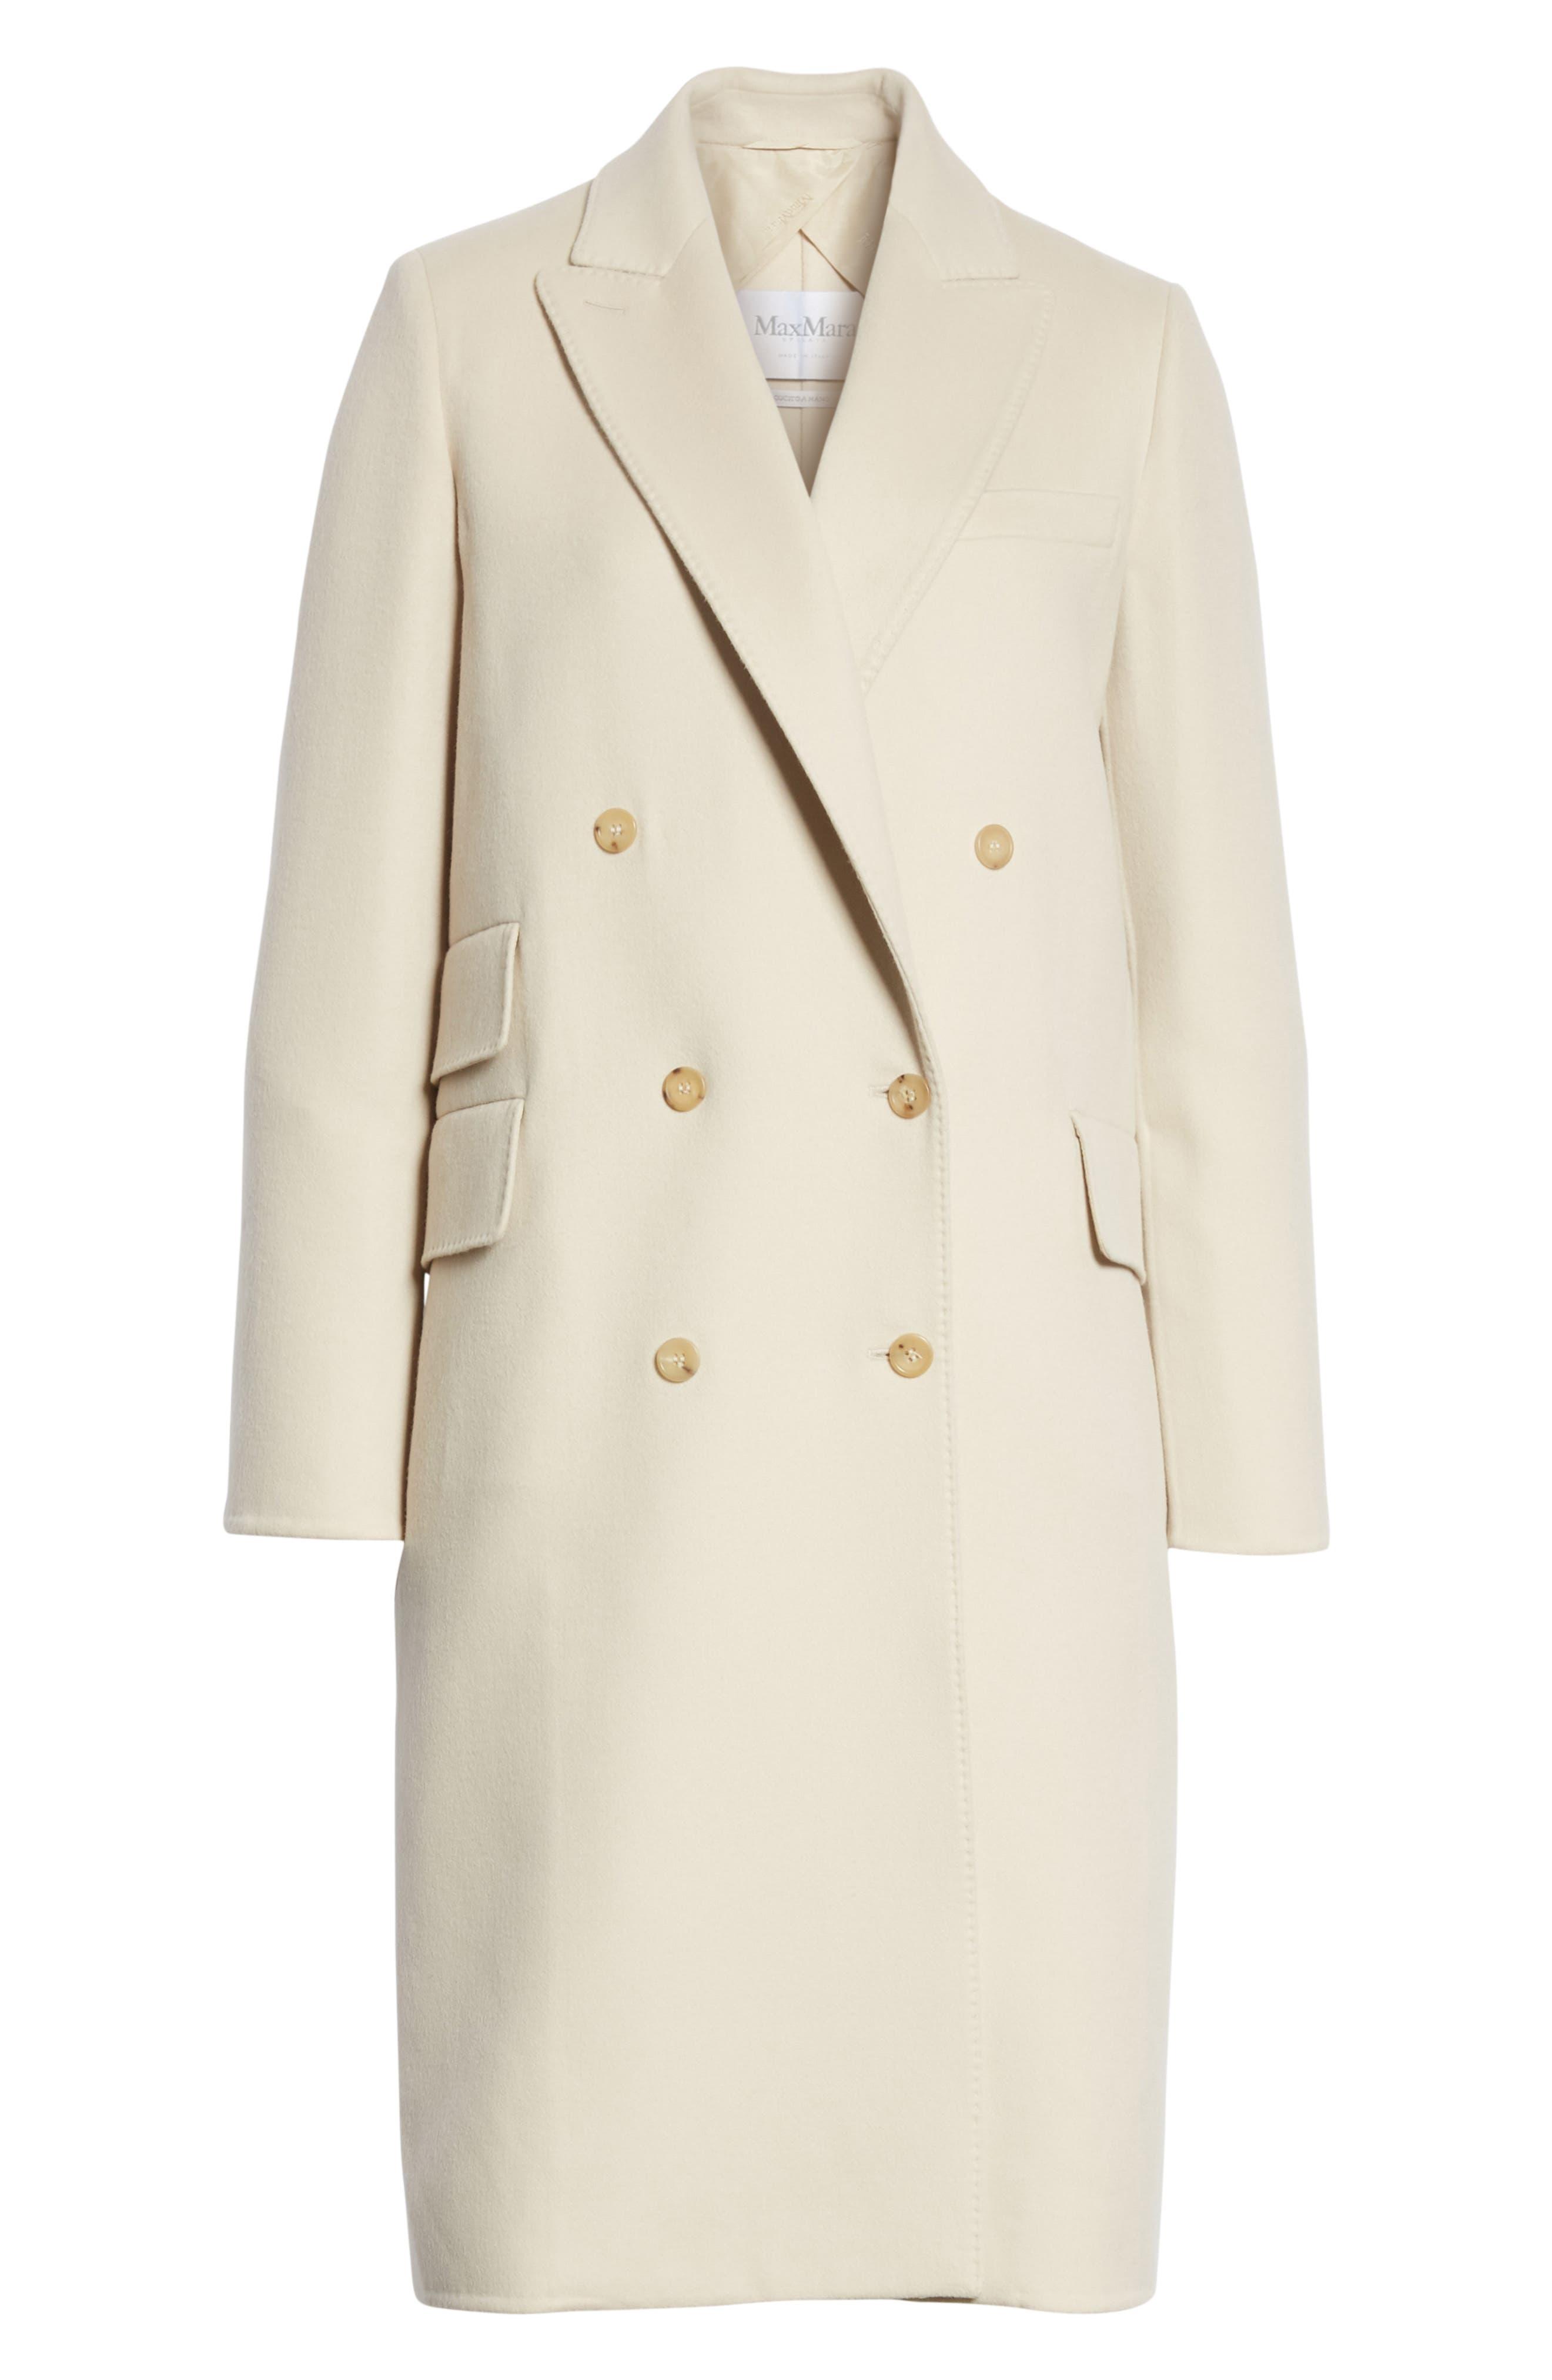 Armonia Wool & Cashmere Coat,                             Alternate thumbnail 5, color,                             906